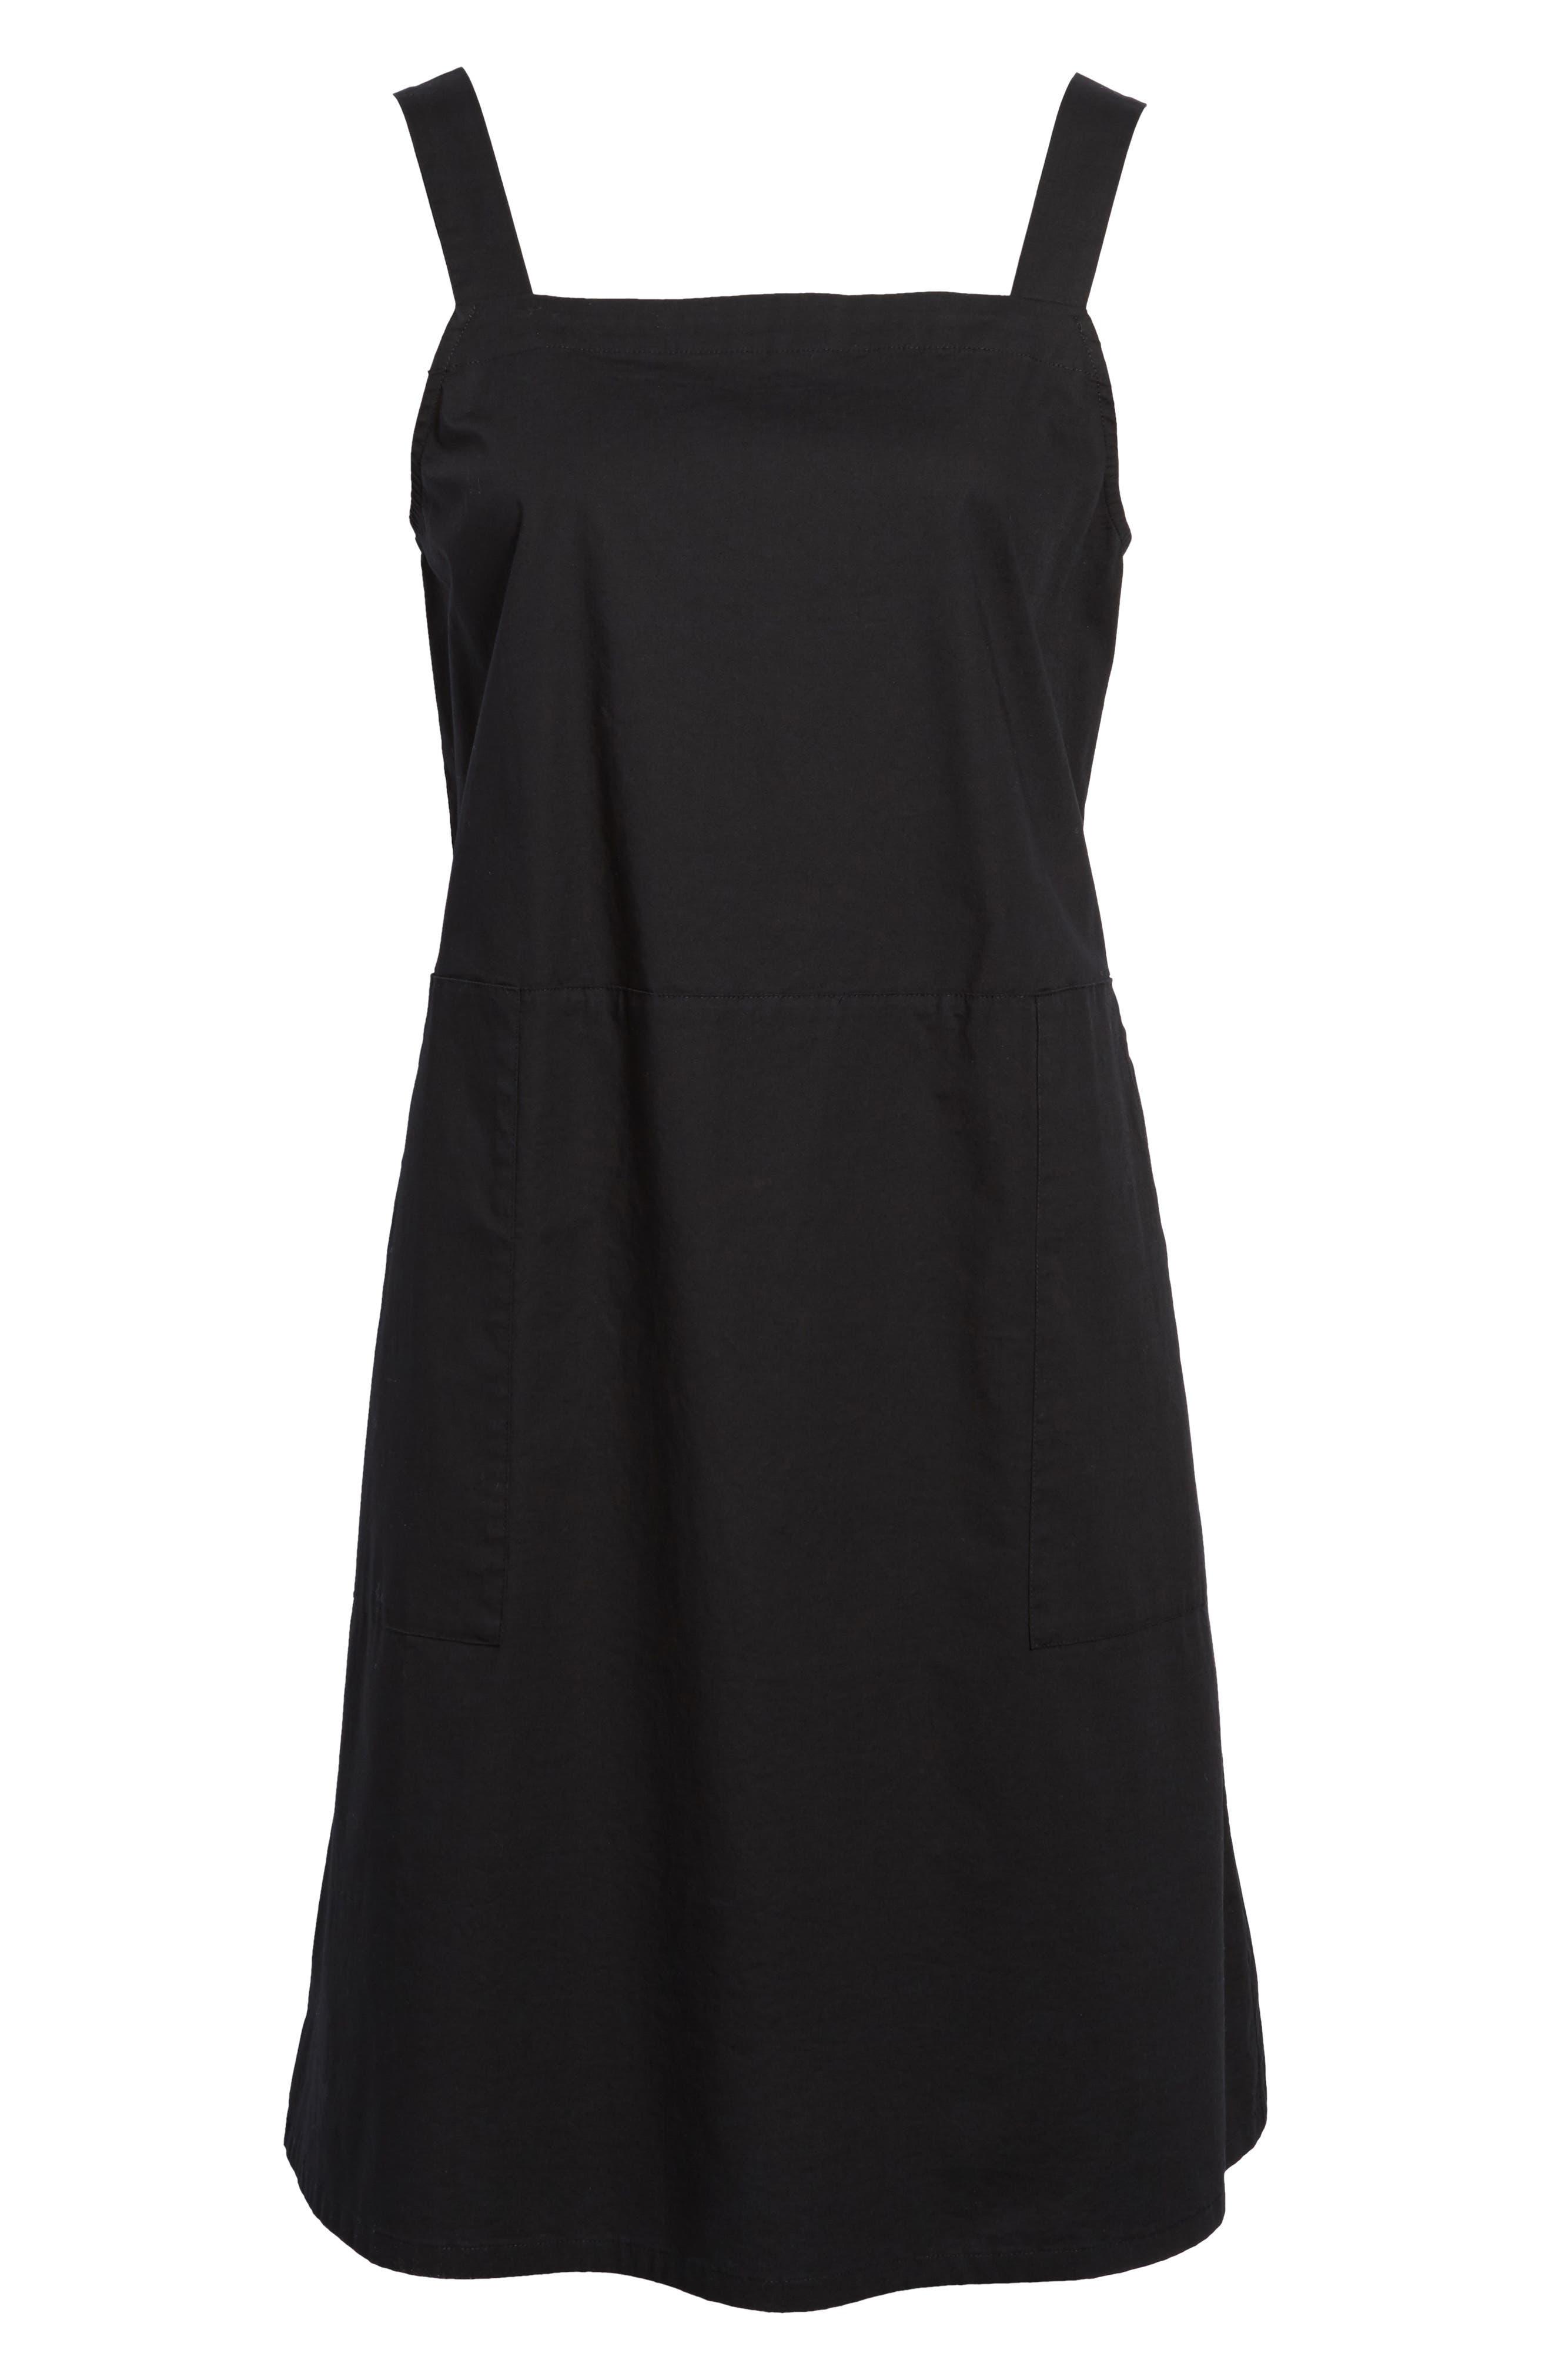 Stretch Organic Cotton Tank Dress,                             Alternate thumbnail 6, color,                             Black